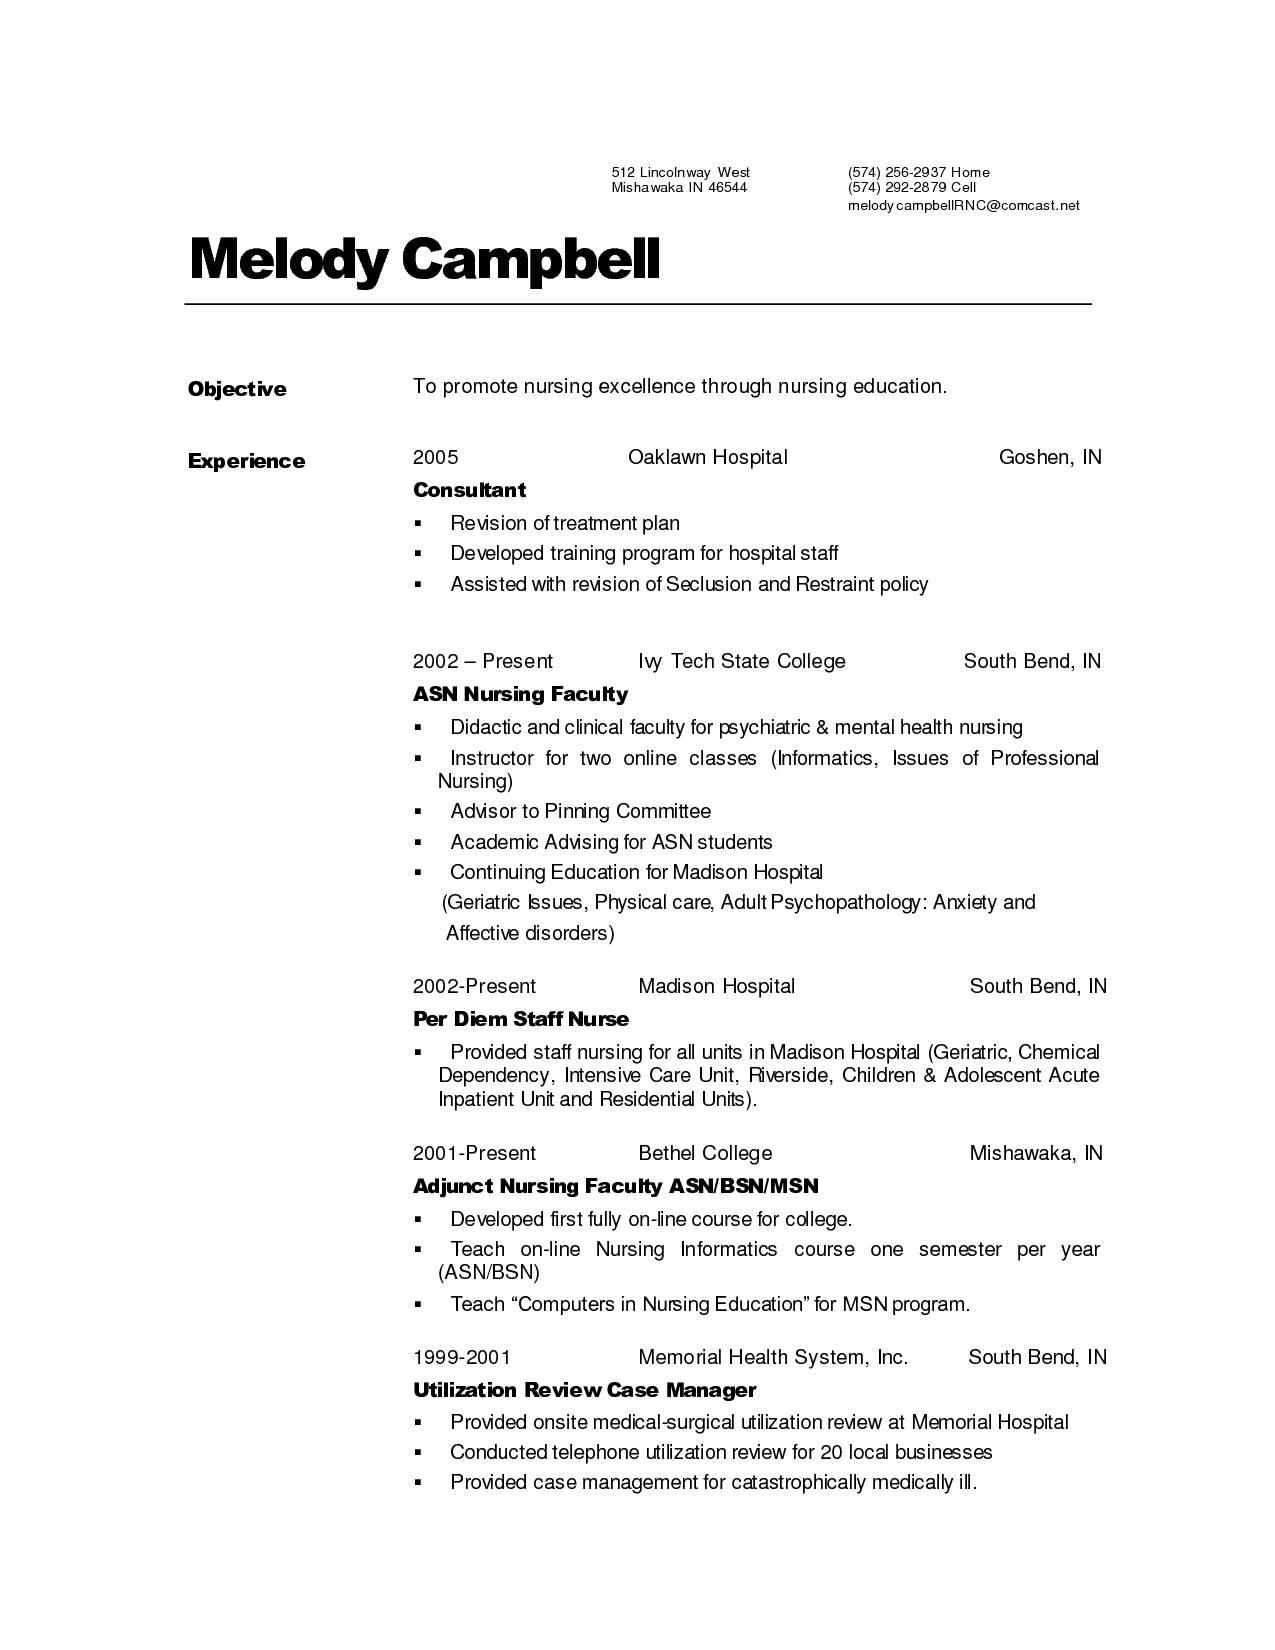 Nursing Resume Templates Australia